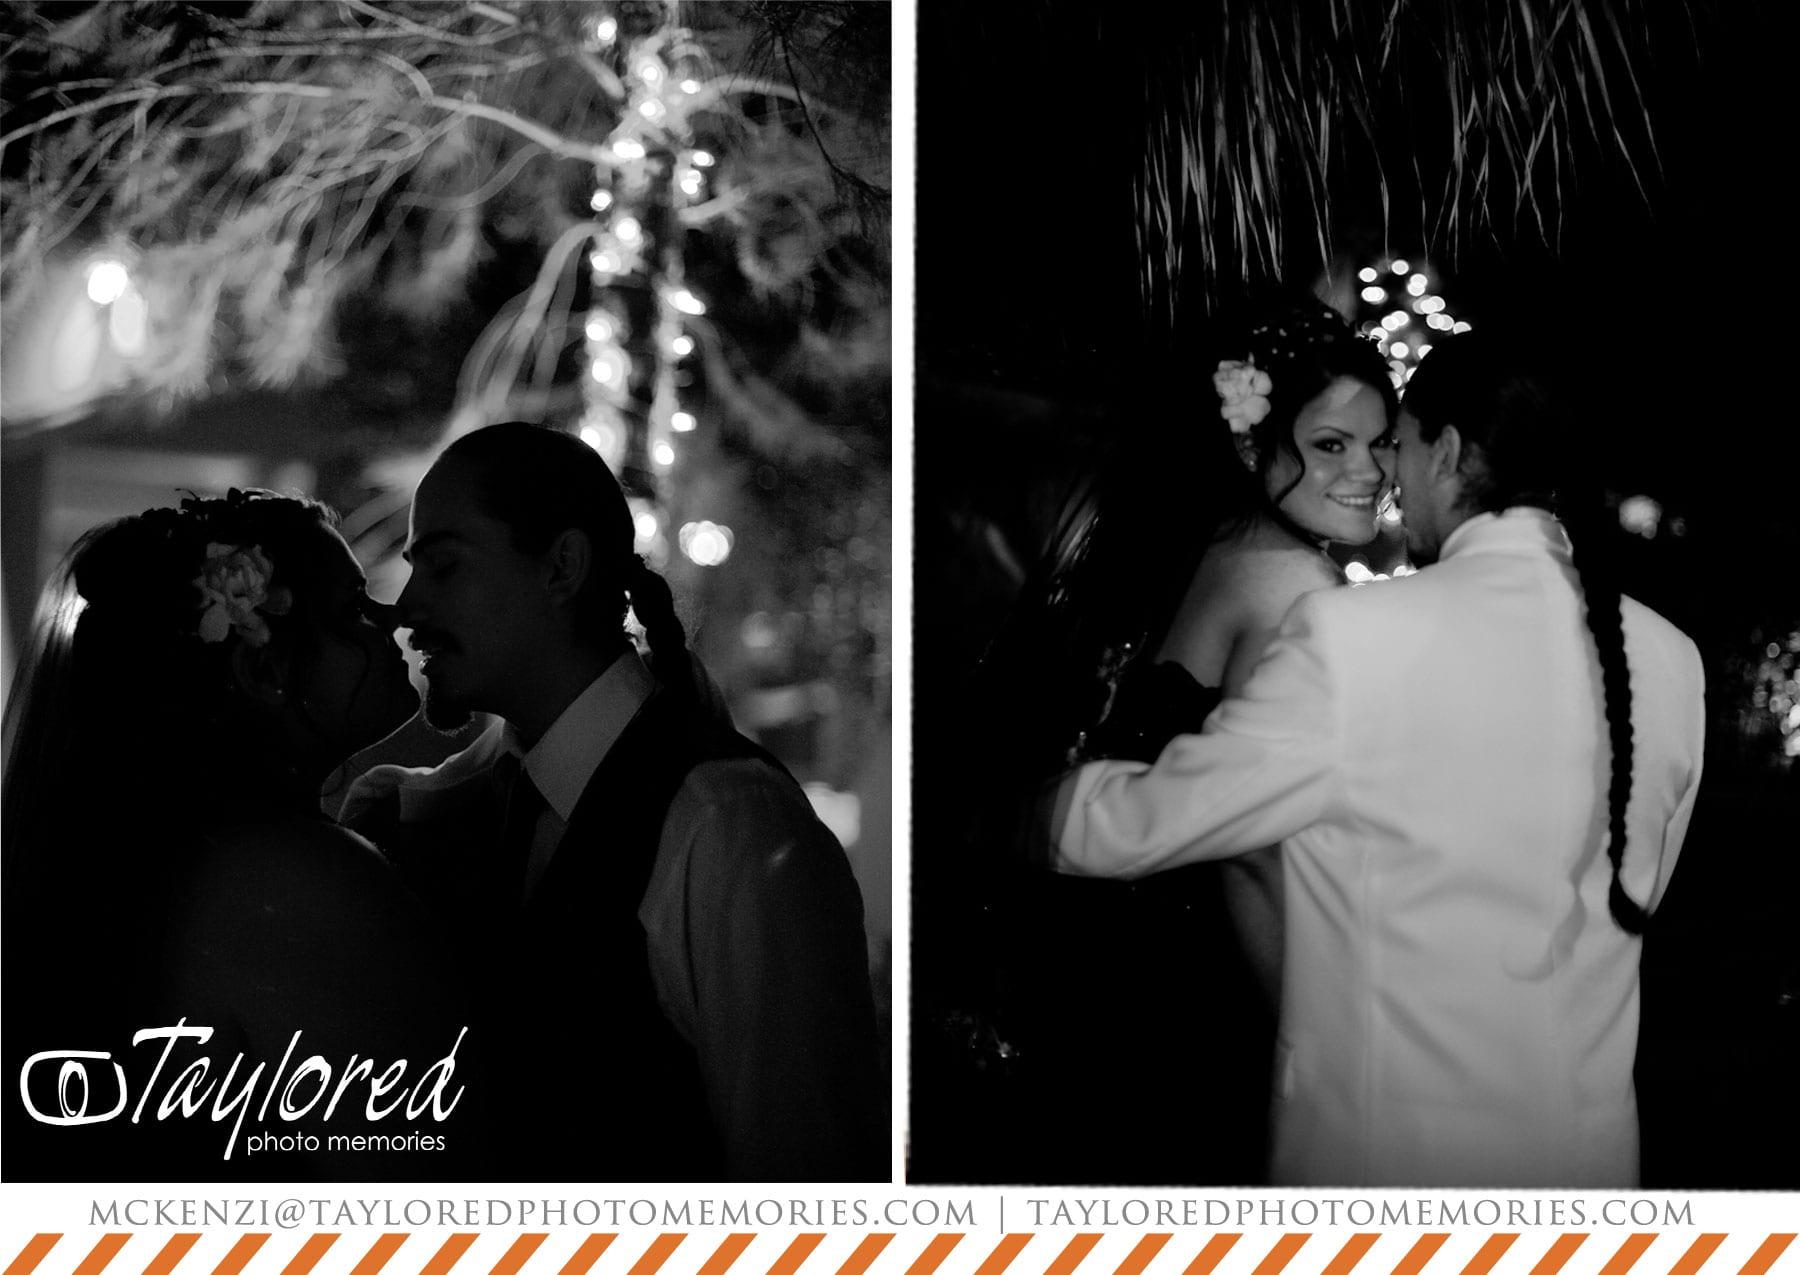 Las Vegas Wedding Photographers - Taylored Photo Memories